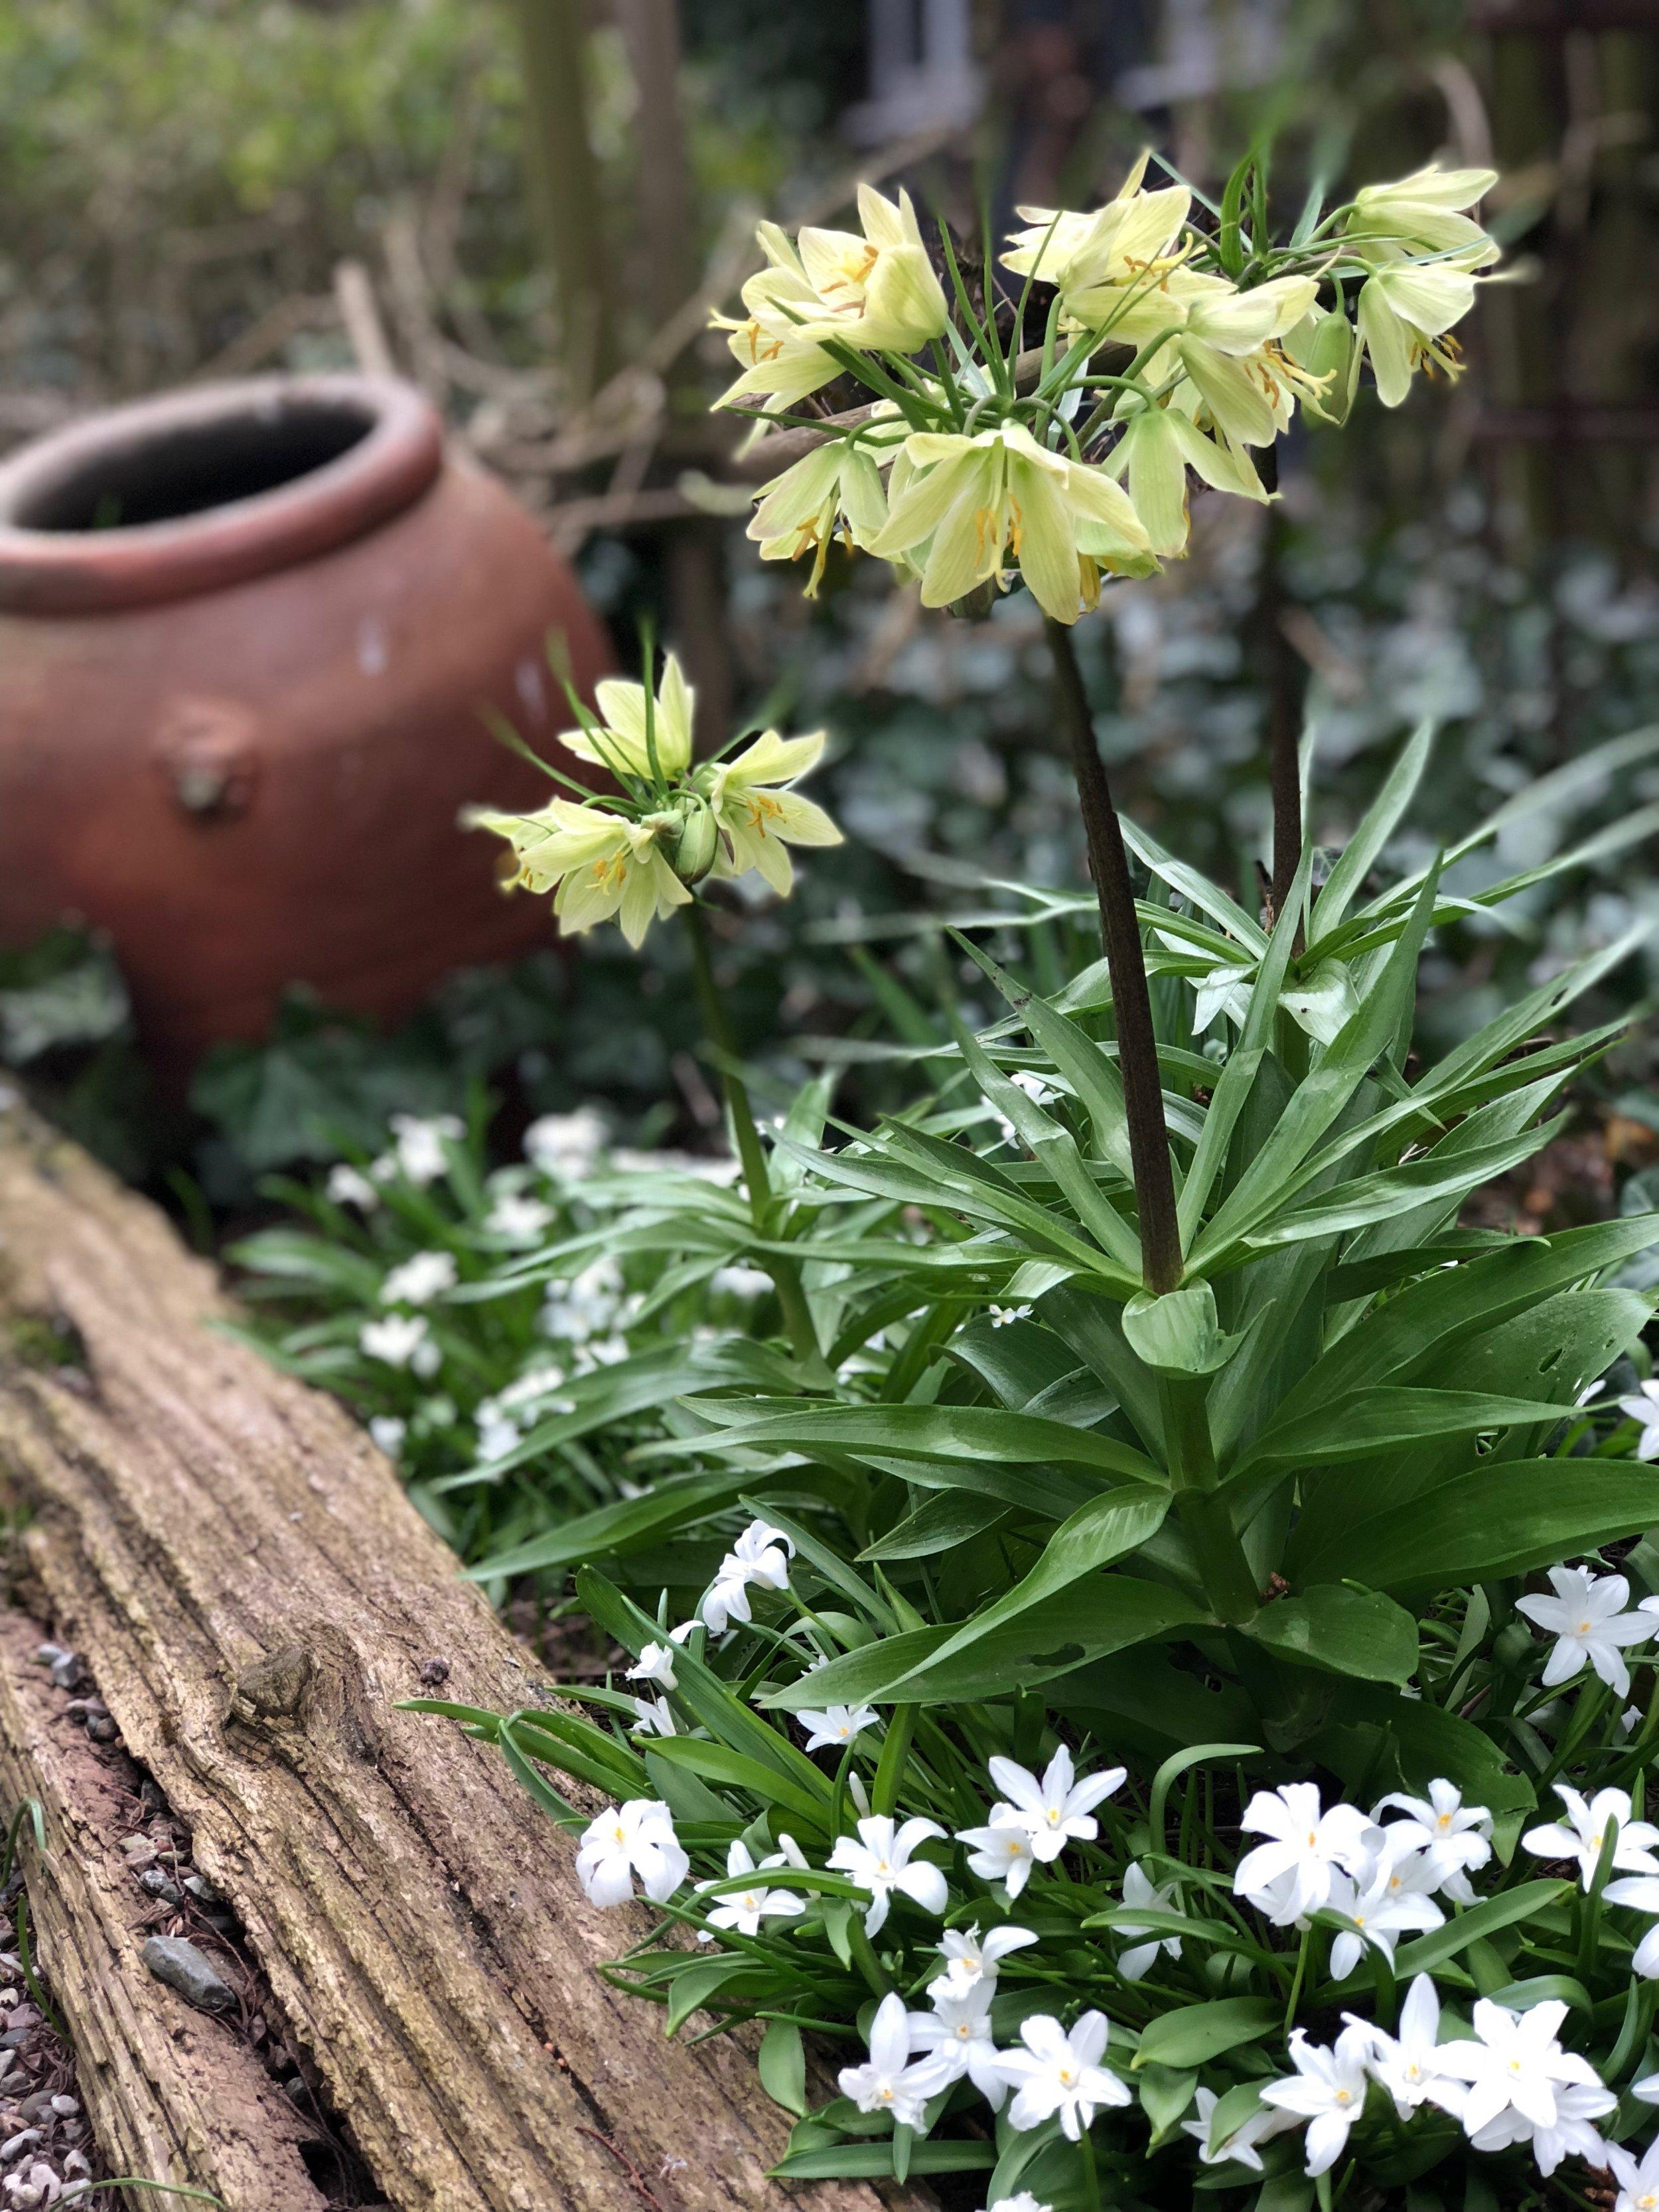 Halmgul kejsarkrona 'Raddeana' (Fritillaria Imperialis)